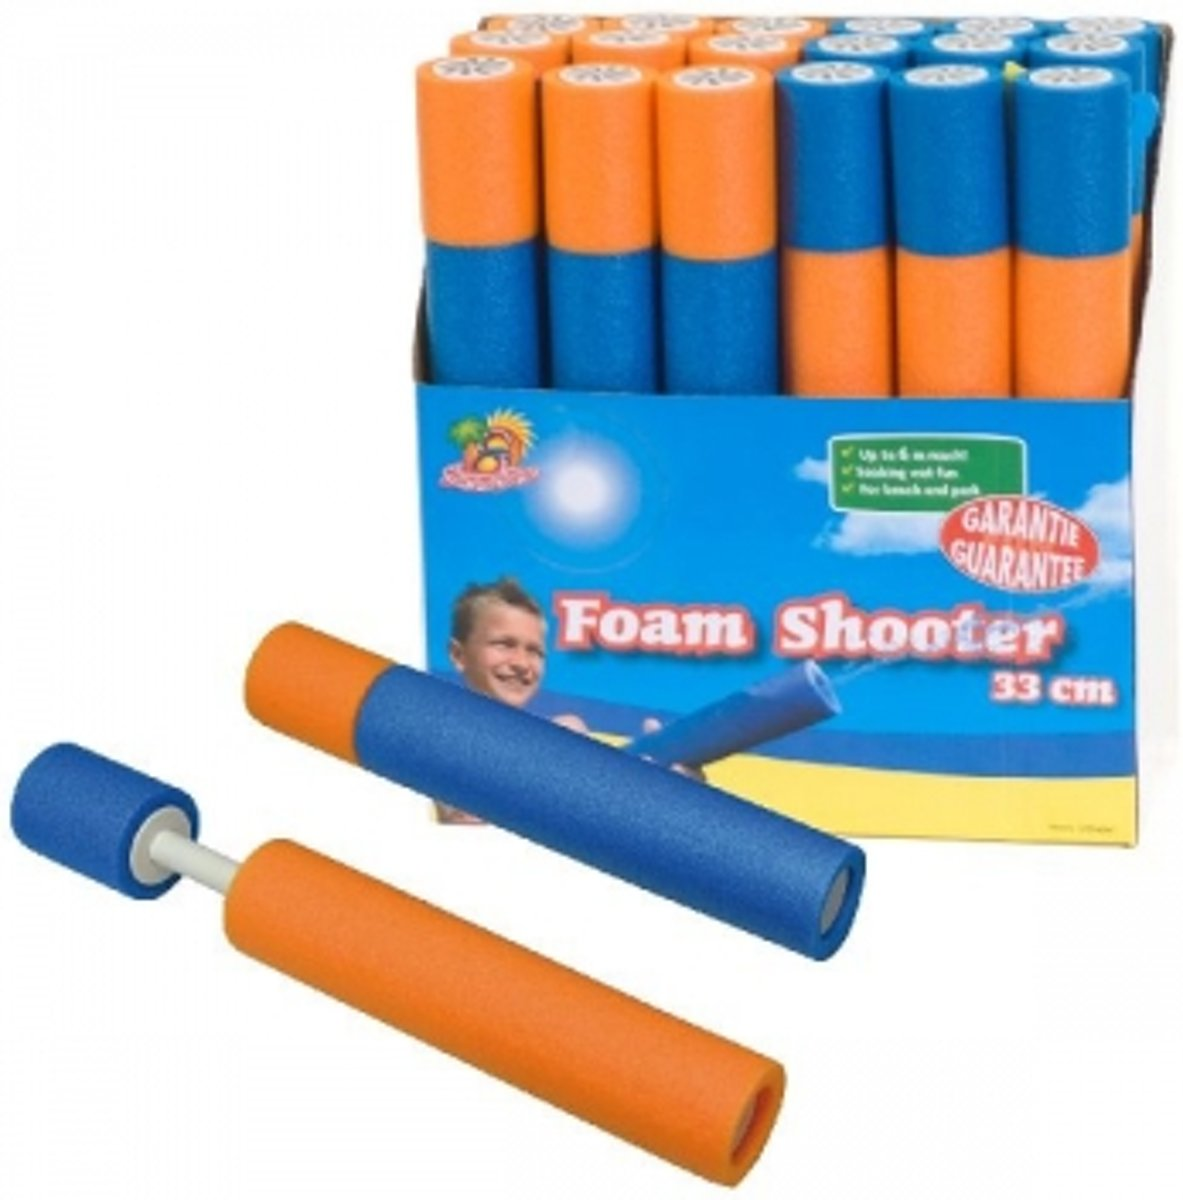 Summertime Foam Shooter 33 cm